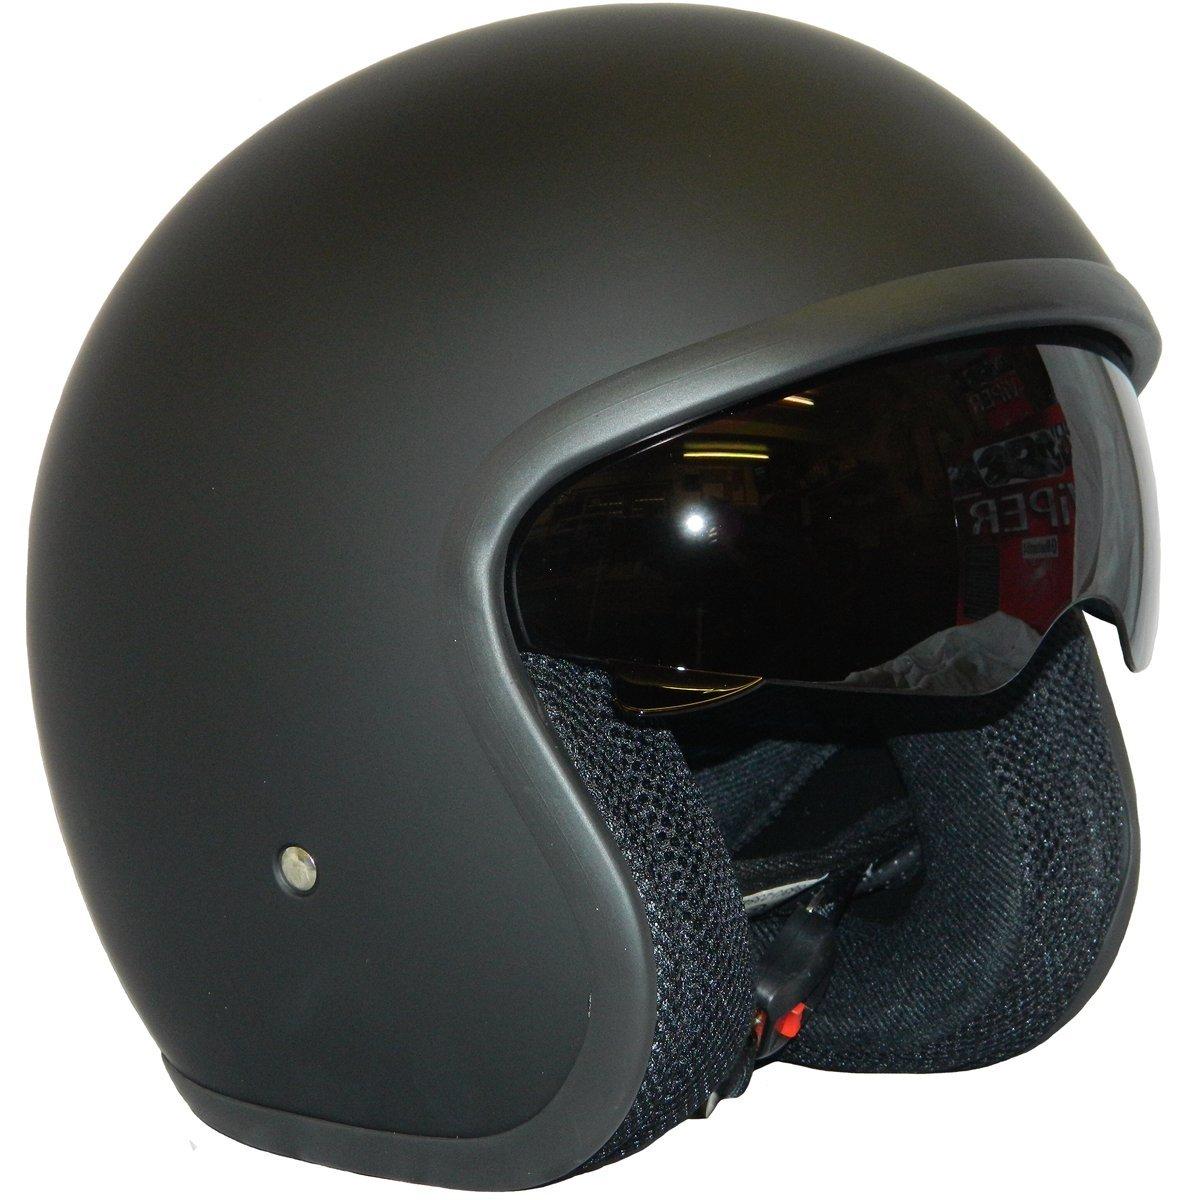 Amazon.es: Casco de la Motocicleta Jet Casco Cascos Abiertos VIPER RS-V06 Casco de Moto Con Visera Nuevos Colores (XS, Matt Negro)